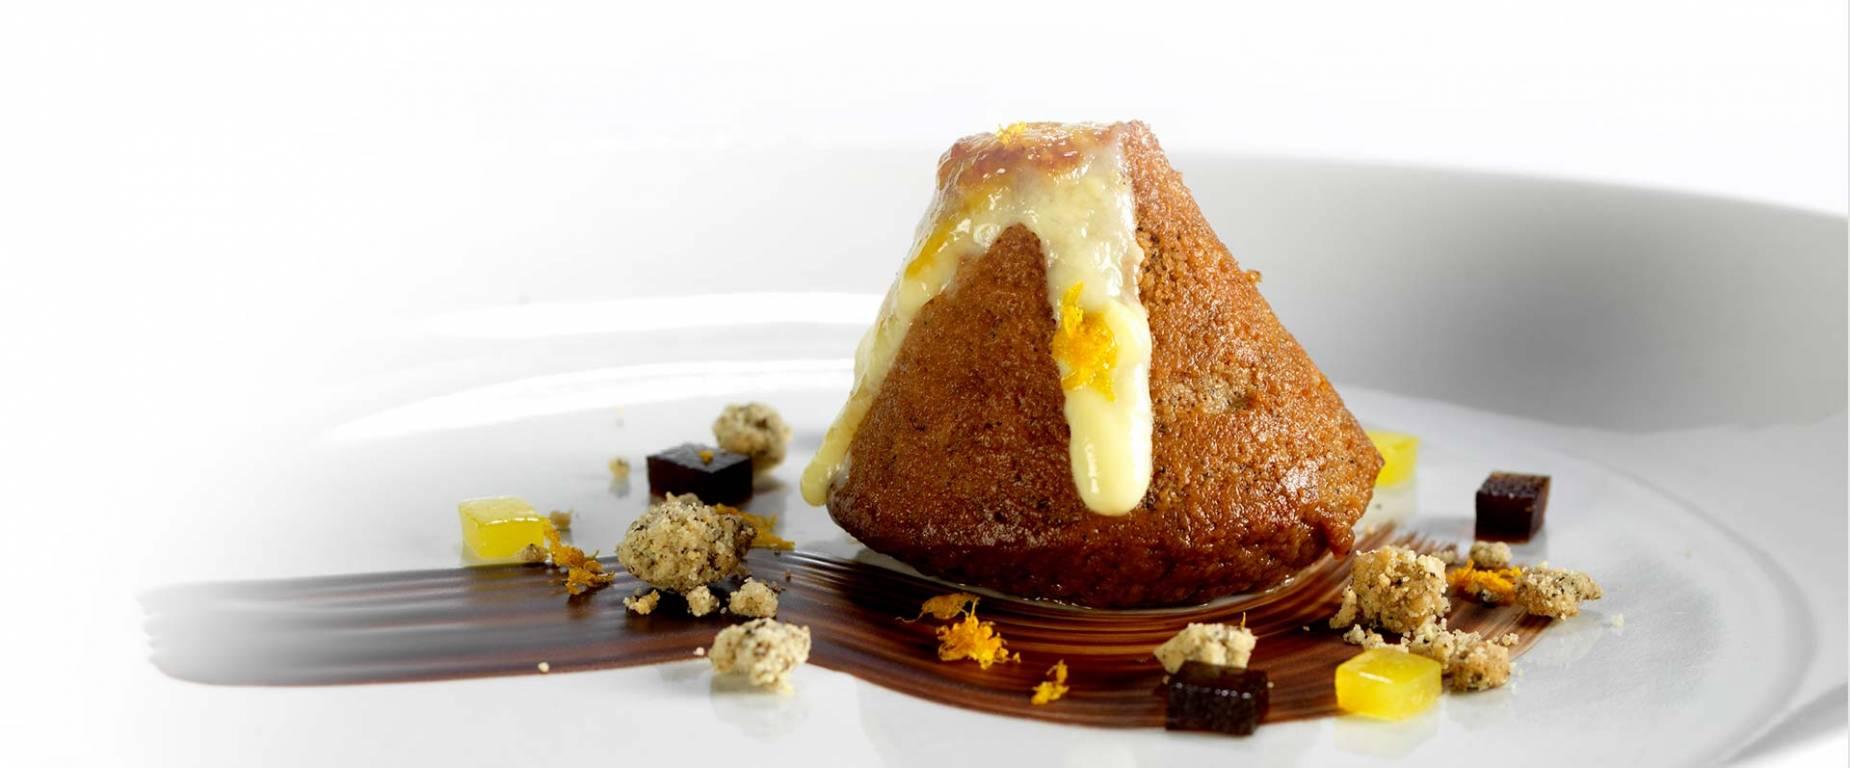 d9c4e-cuina-volcanica-restaurants-garrotxa11.jpg